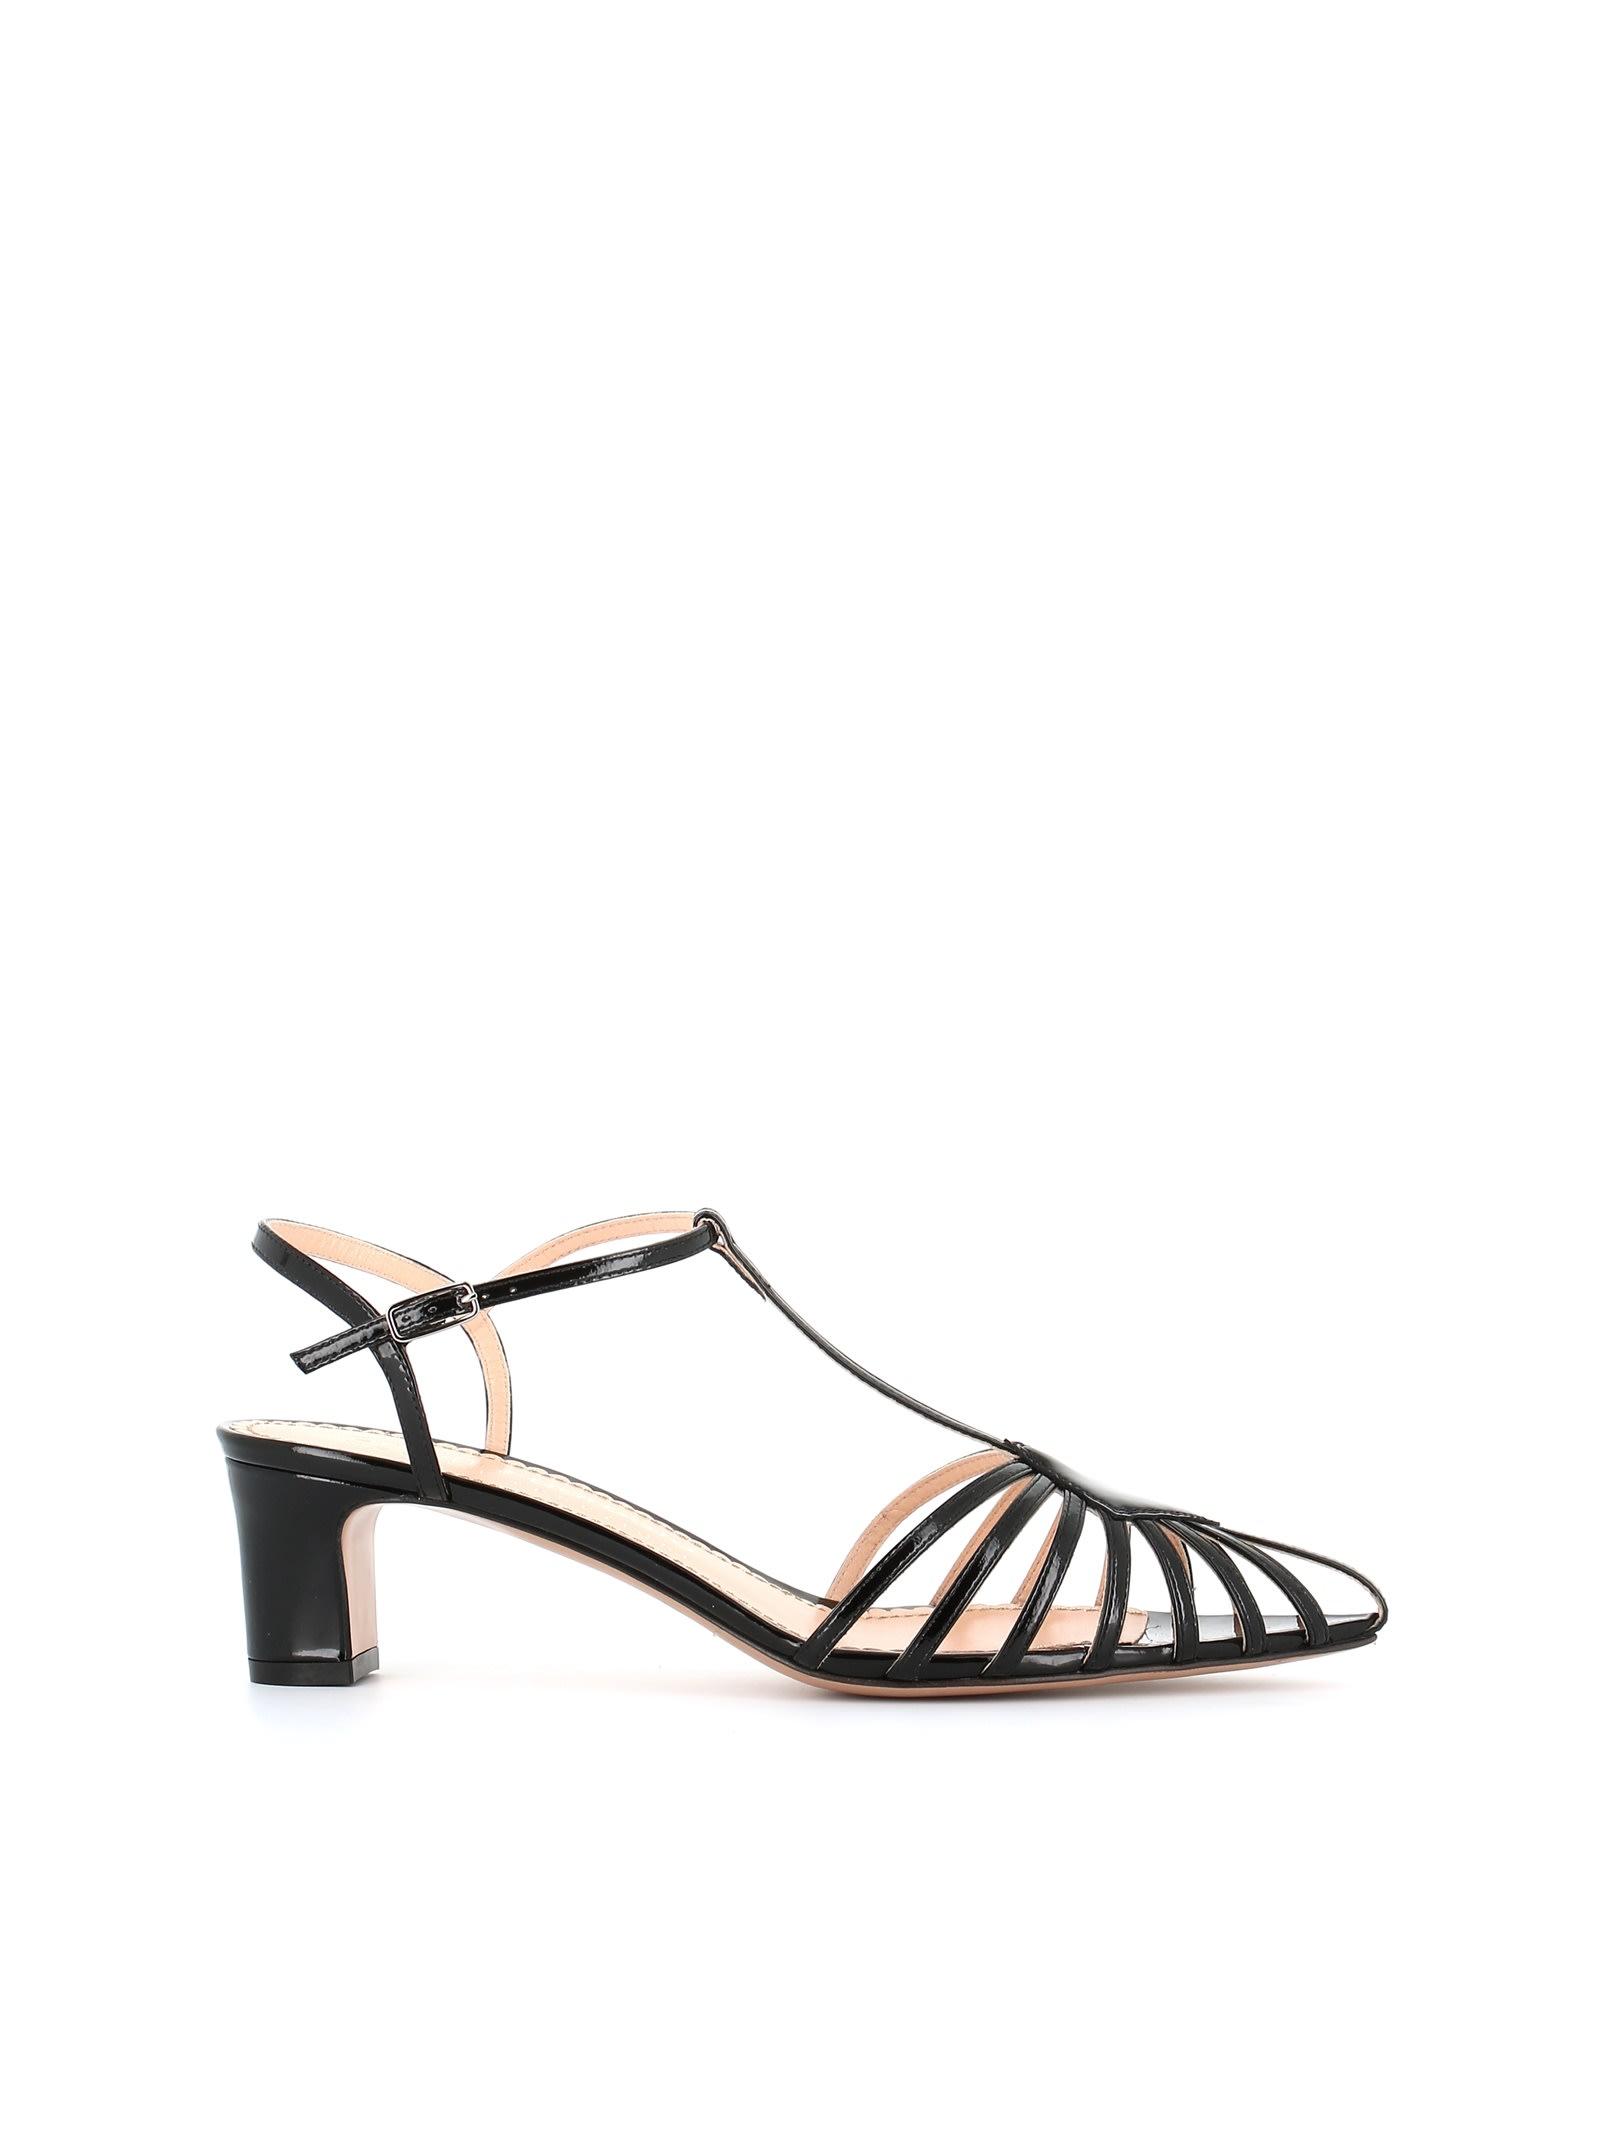 Sandal Ab0629